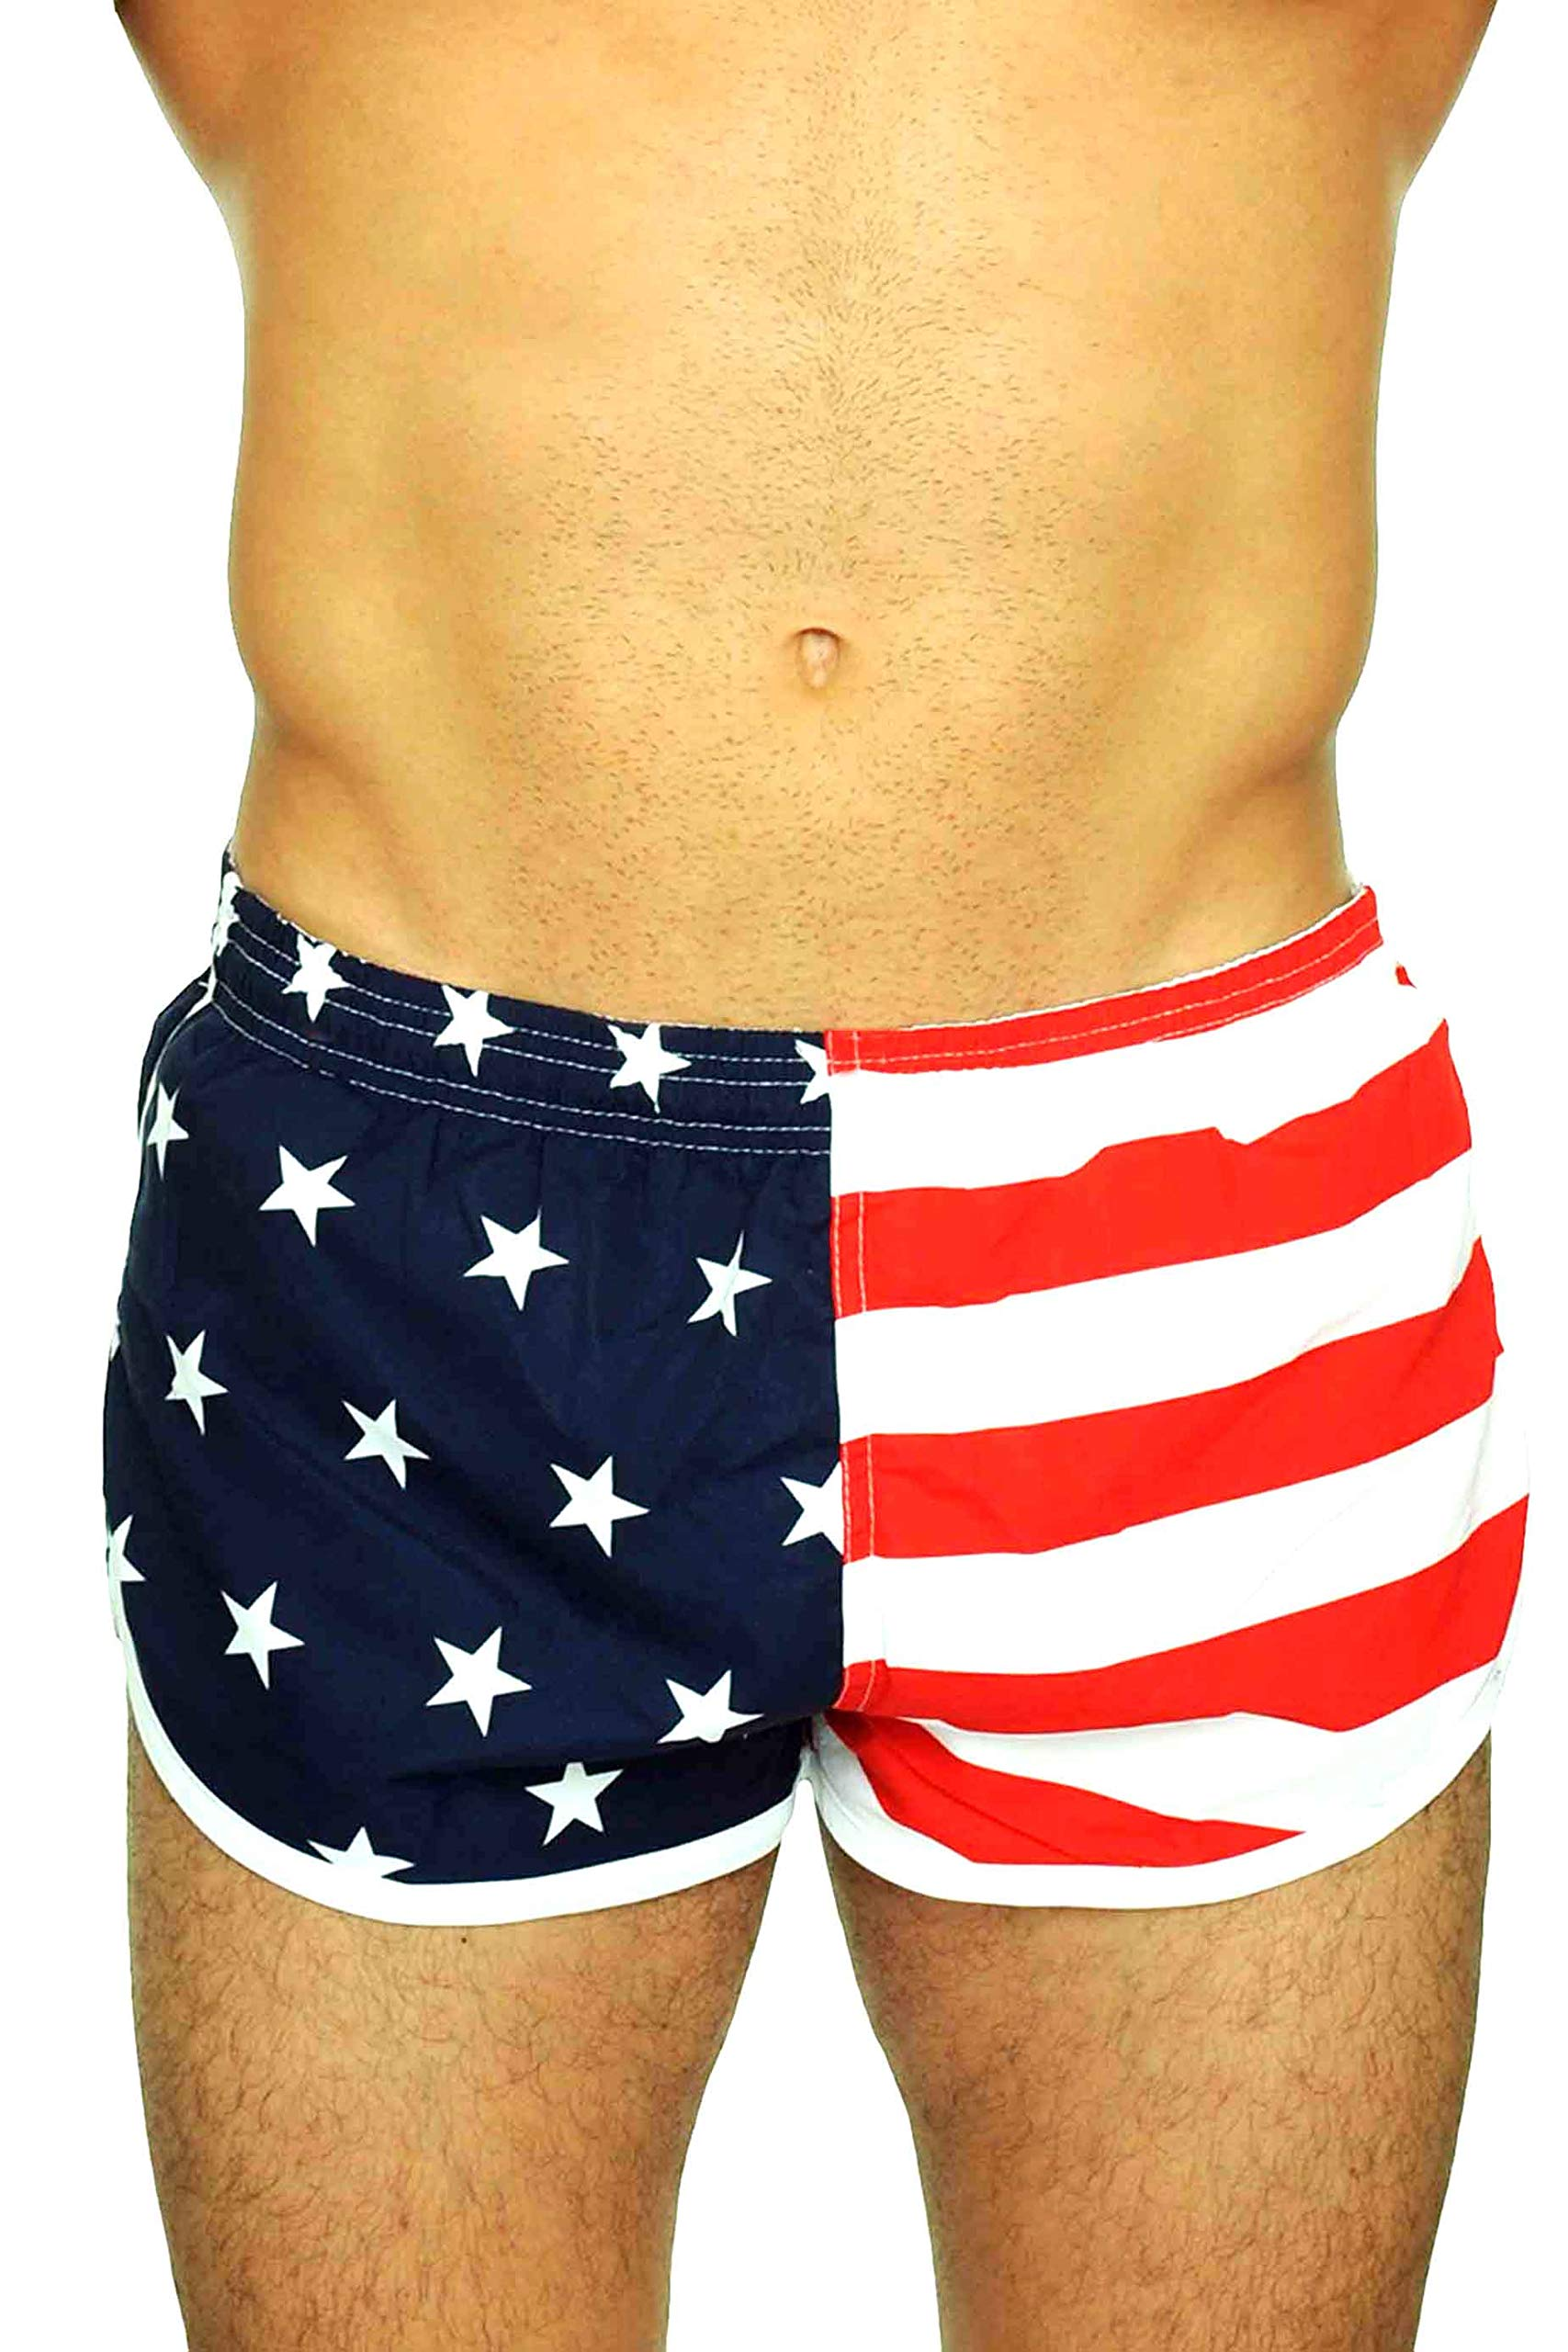 de4de6aee1 Galleon - UZZI Men's Running Shorts Swimwear Trunks 1830, American Flag,  XX-Large